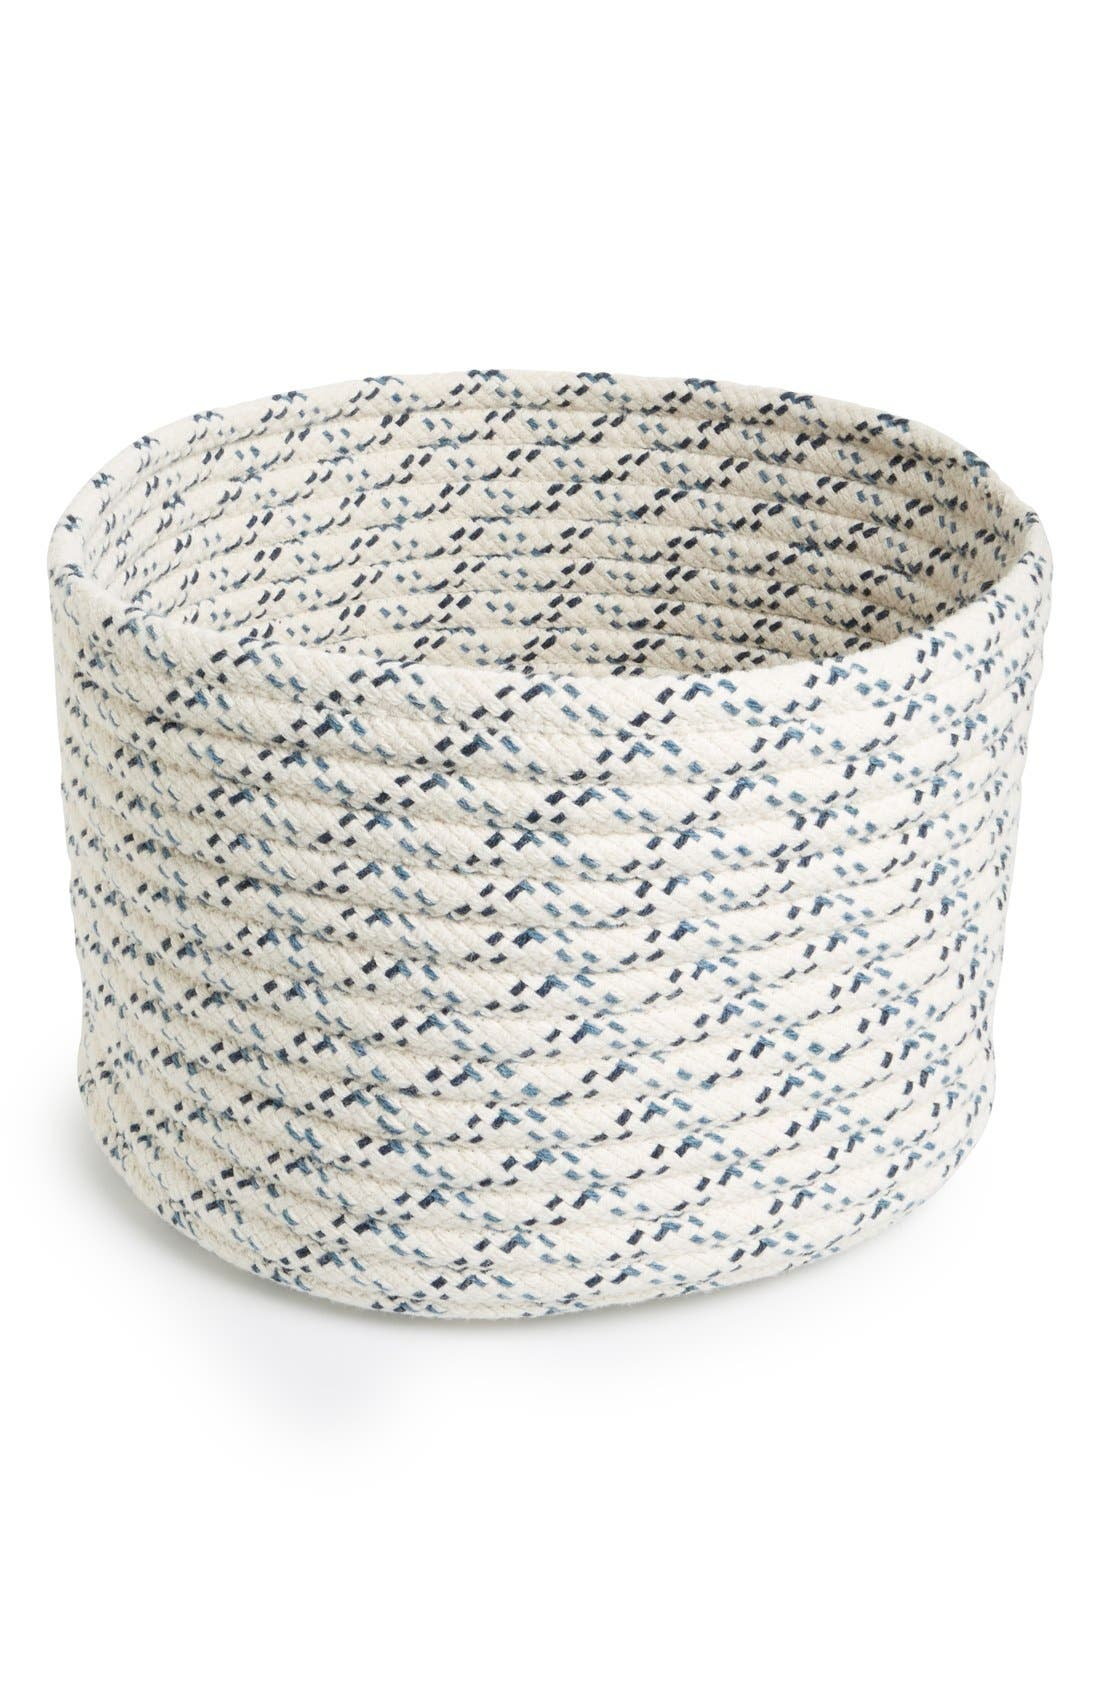 Main Image - Colonial Mills Braided Storage Basket